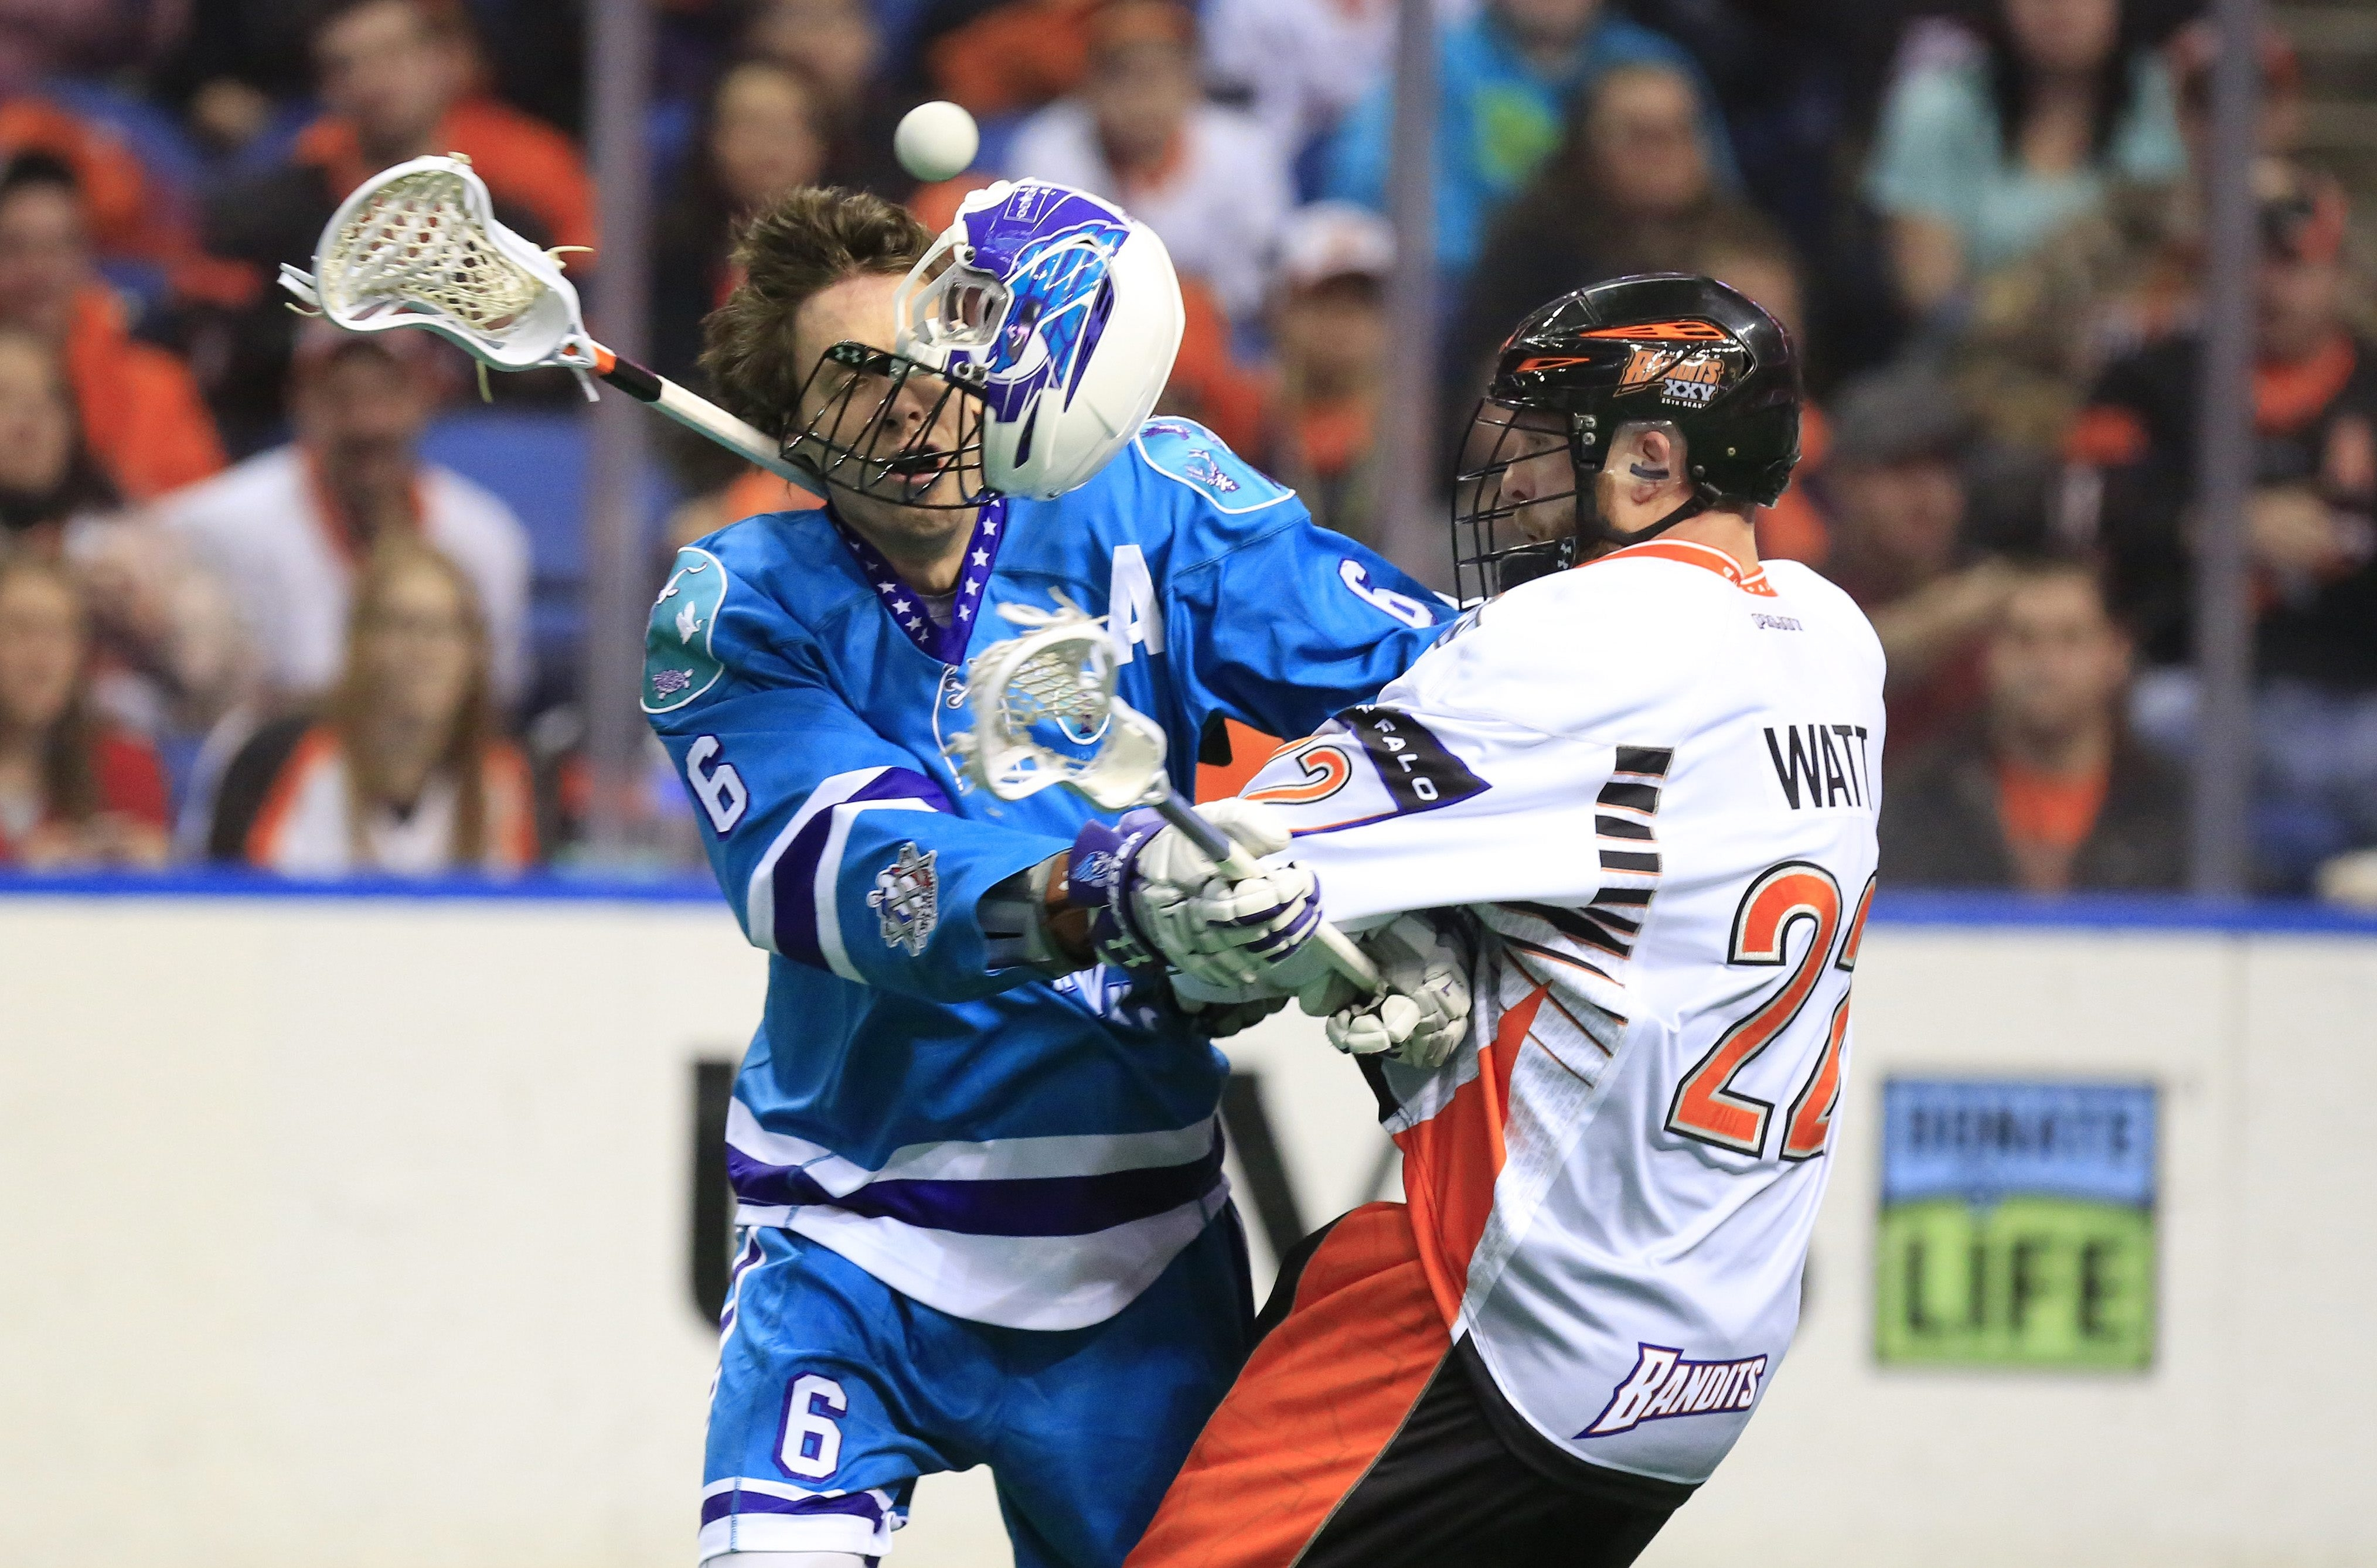 Buffalo's Andrew Watt knocks off the helmet of Rochester's Dan Dawson during the Bandits' 14-12 win Saturday.